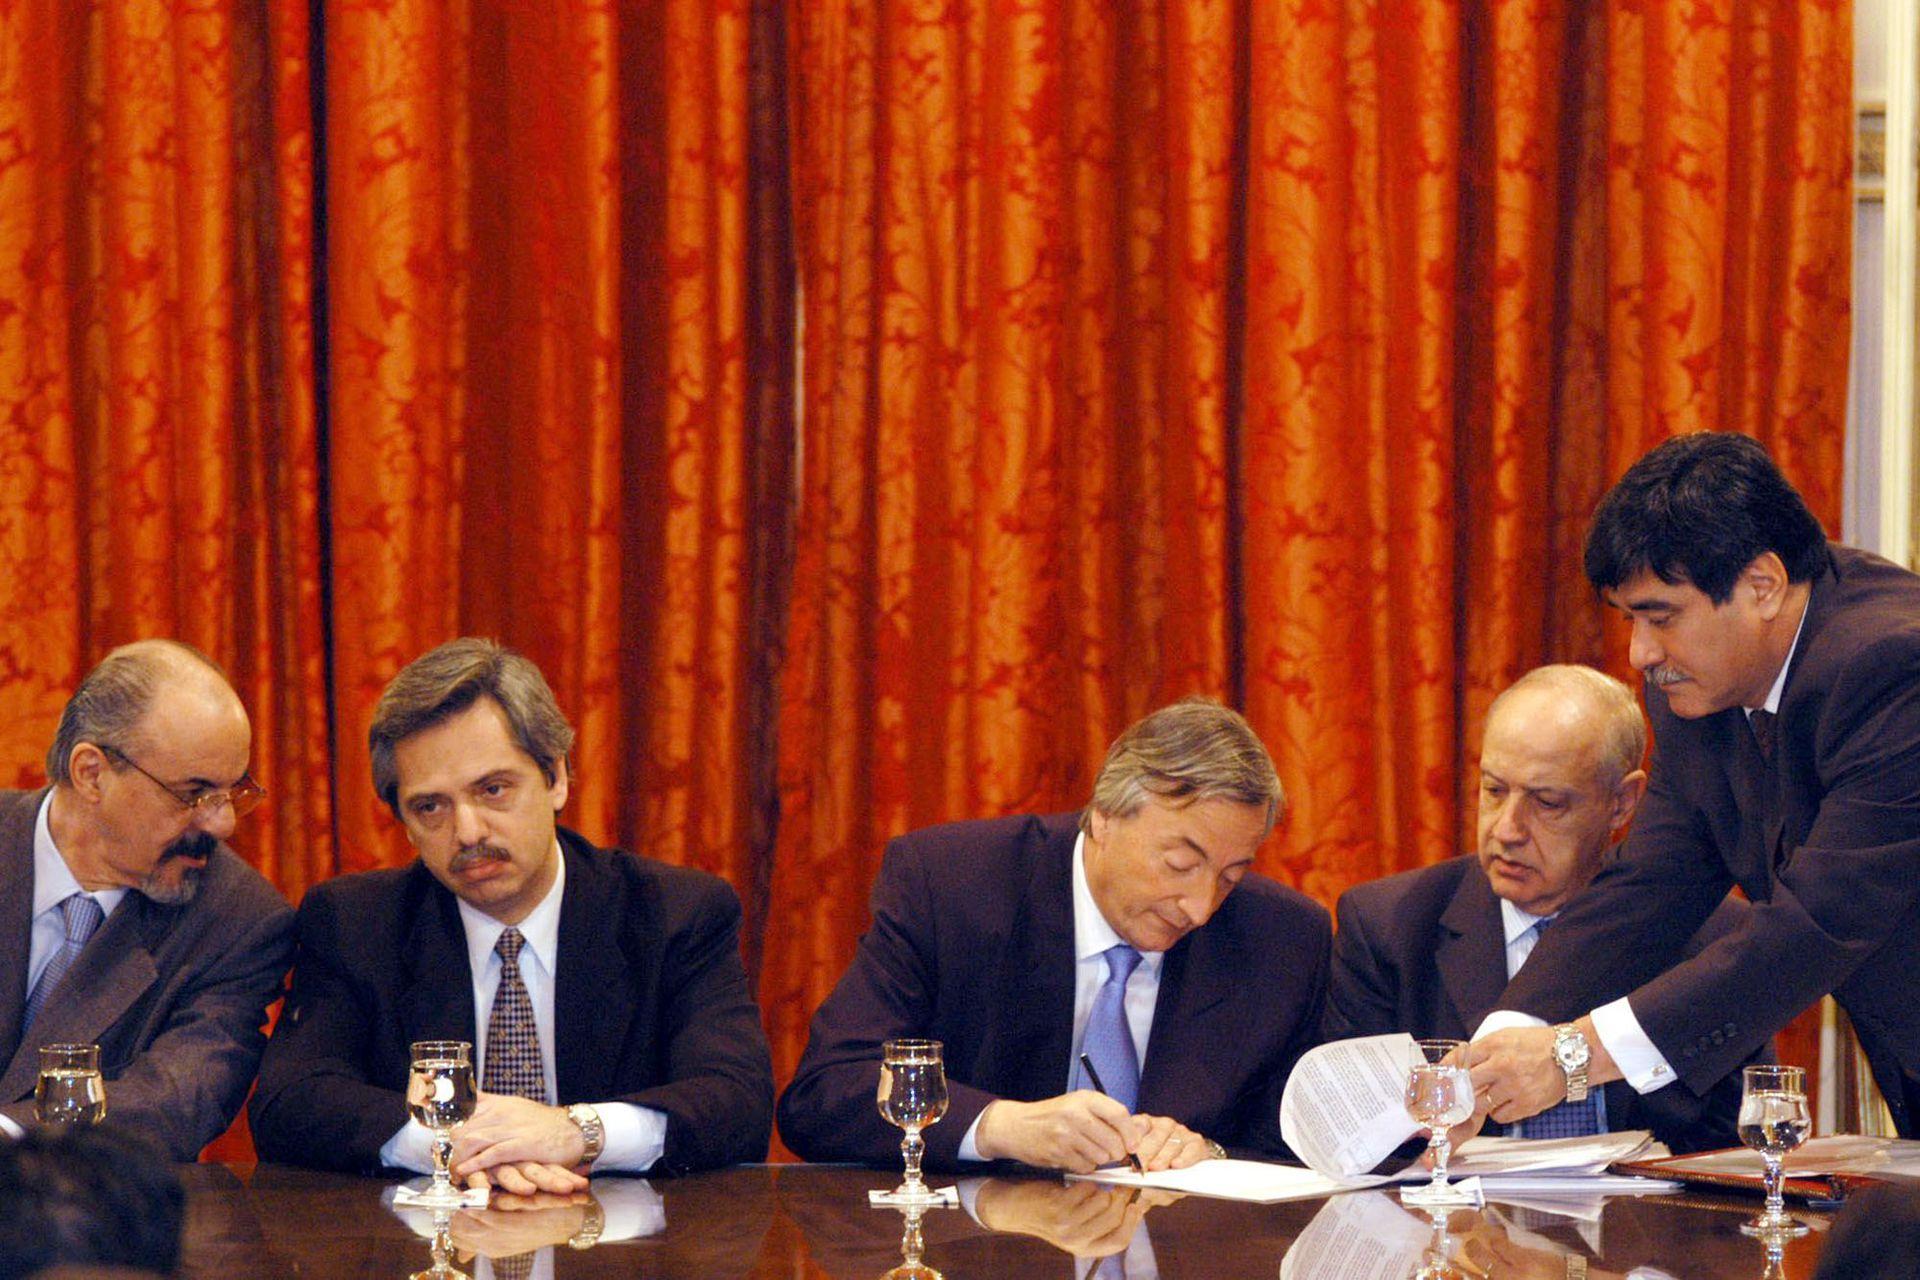 Carlos Tomada, Alberto Fernández, Néstor Kirchner, Roberto Lavagna y Carlos Zannini